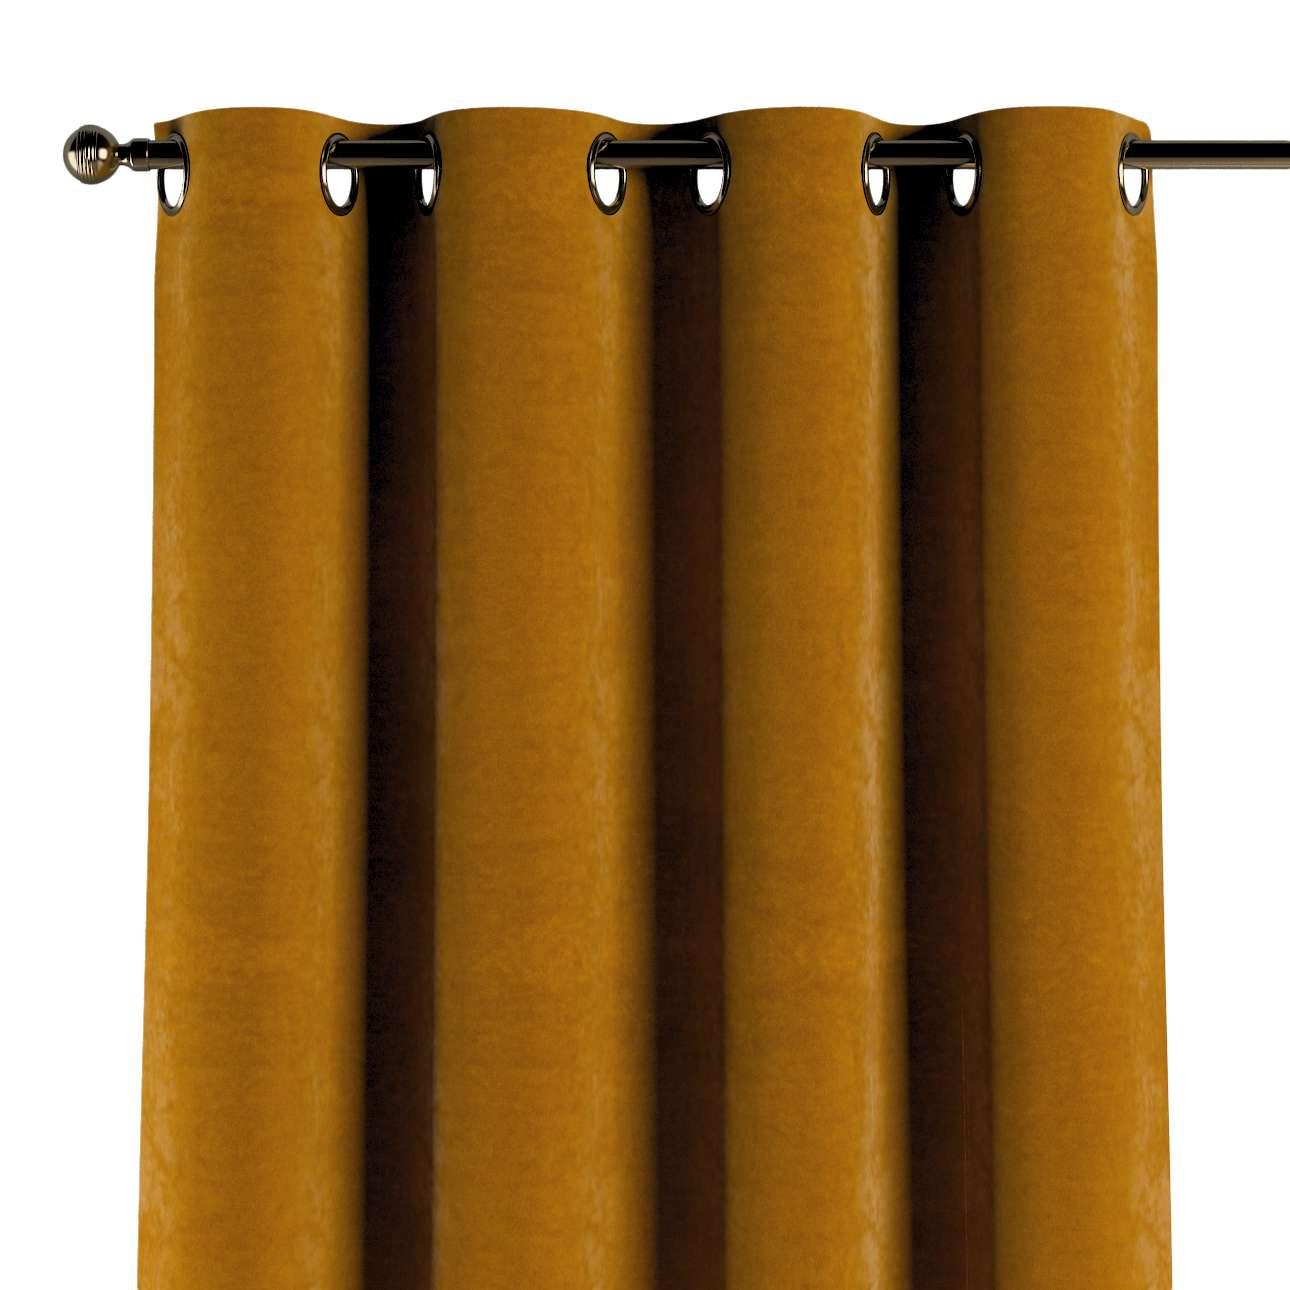 Zasłona na kółkach 1 szt. w kolekcji Velvet, tkanina: 704-23